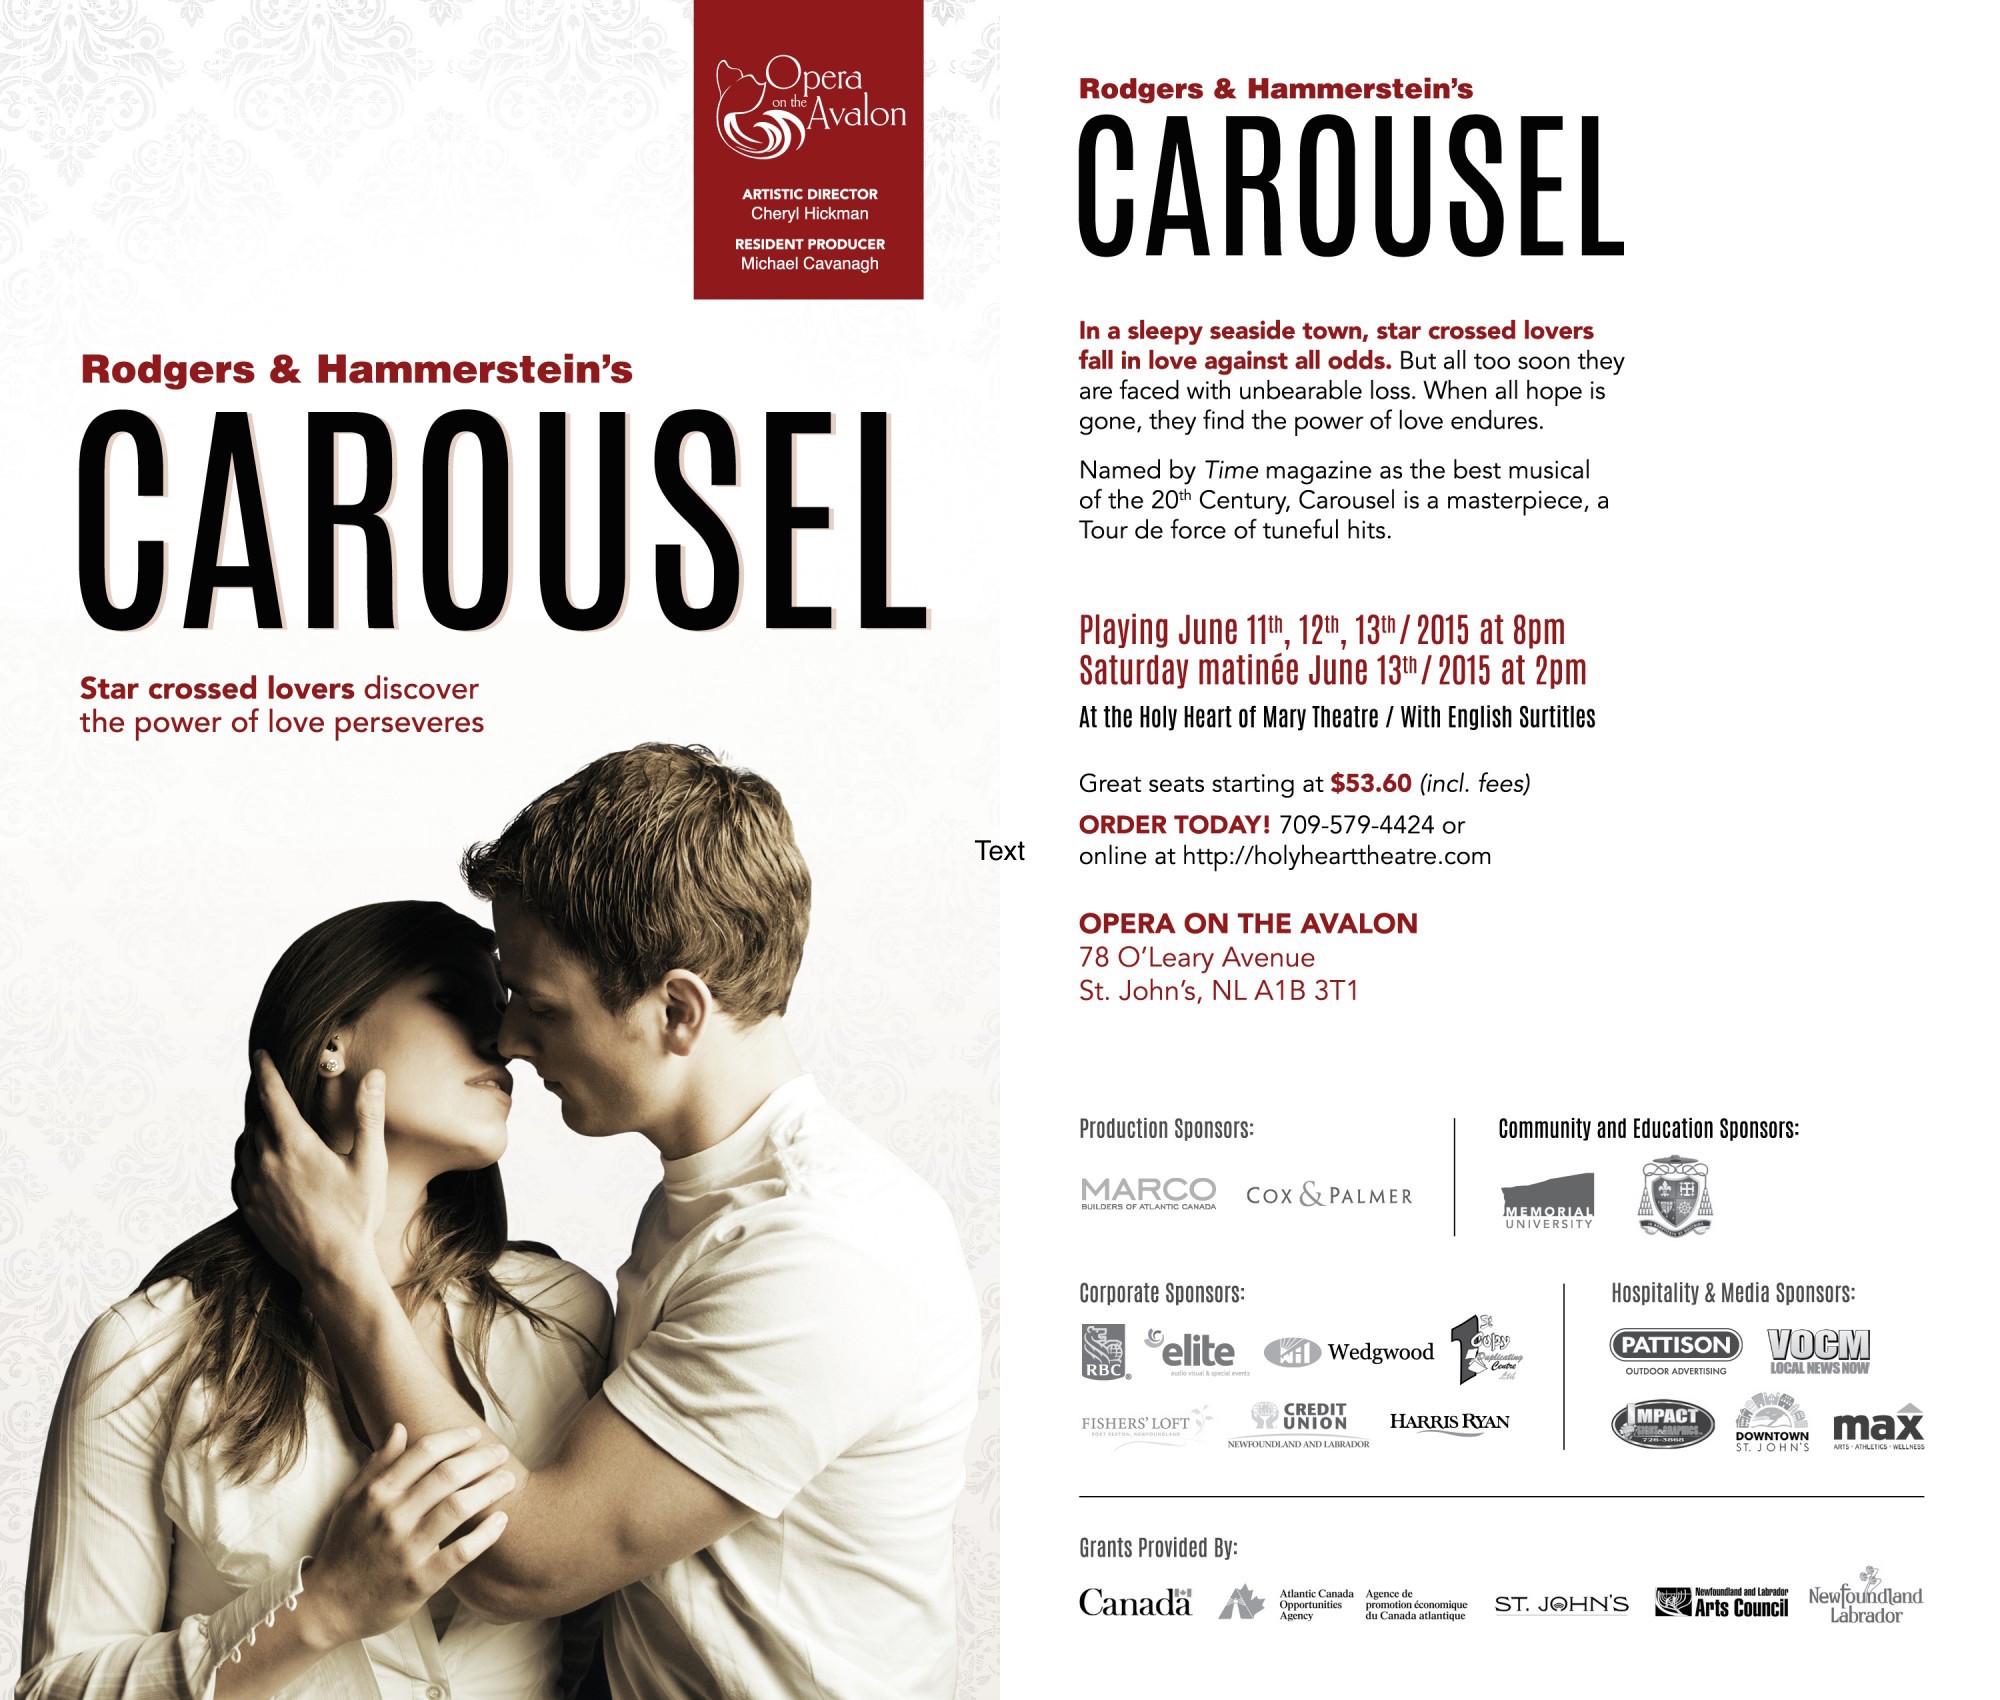 Brochure2-Carousel-Final-e1428368773653.jpg